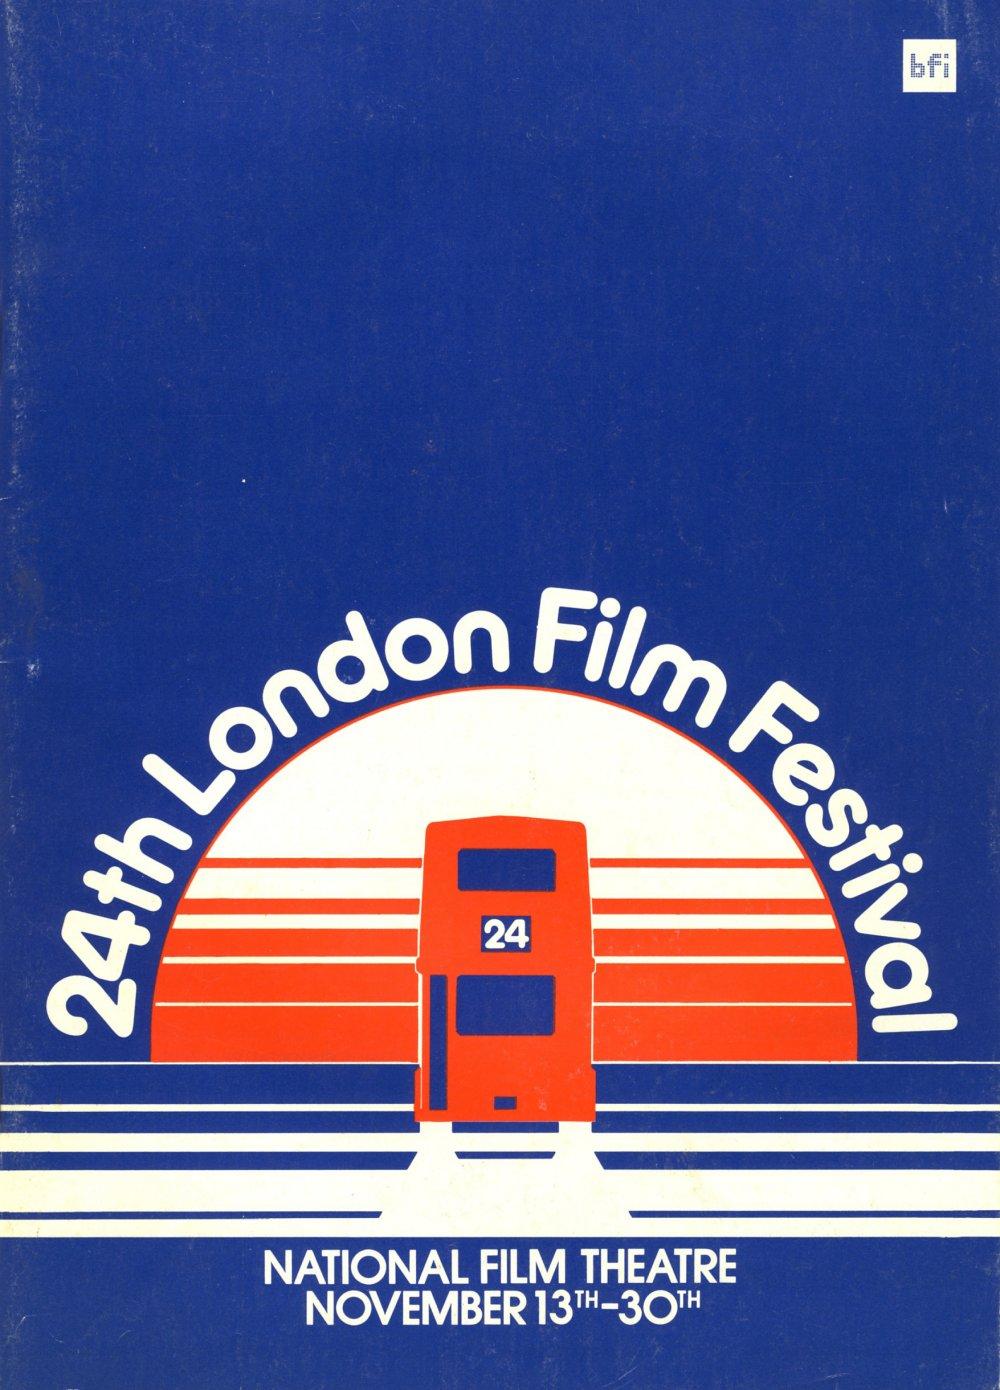 24th London Film Festival poster